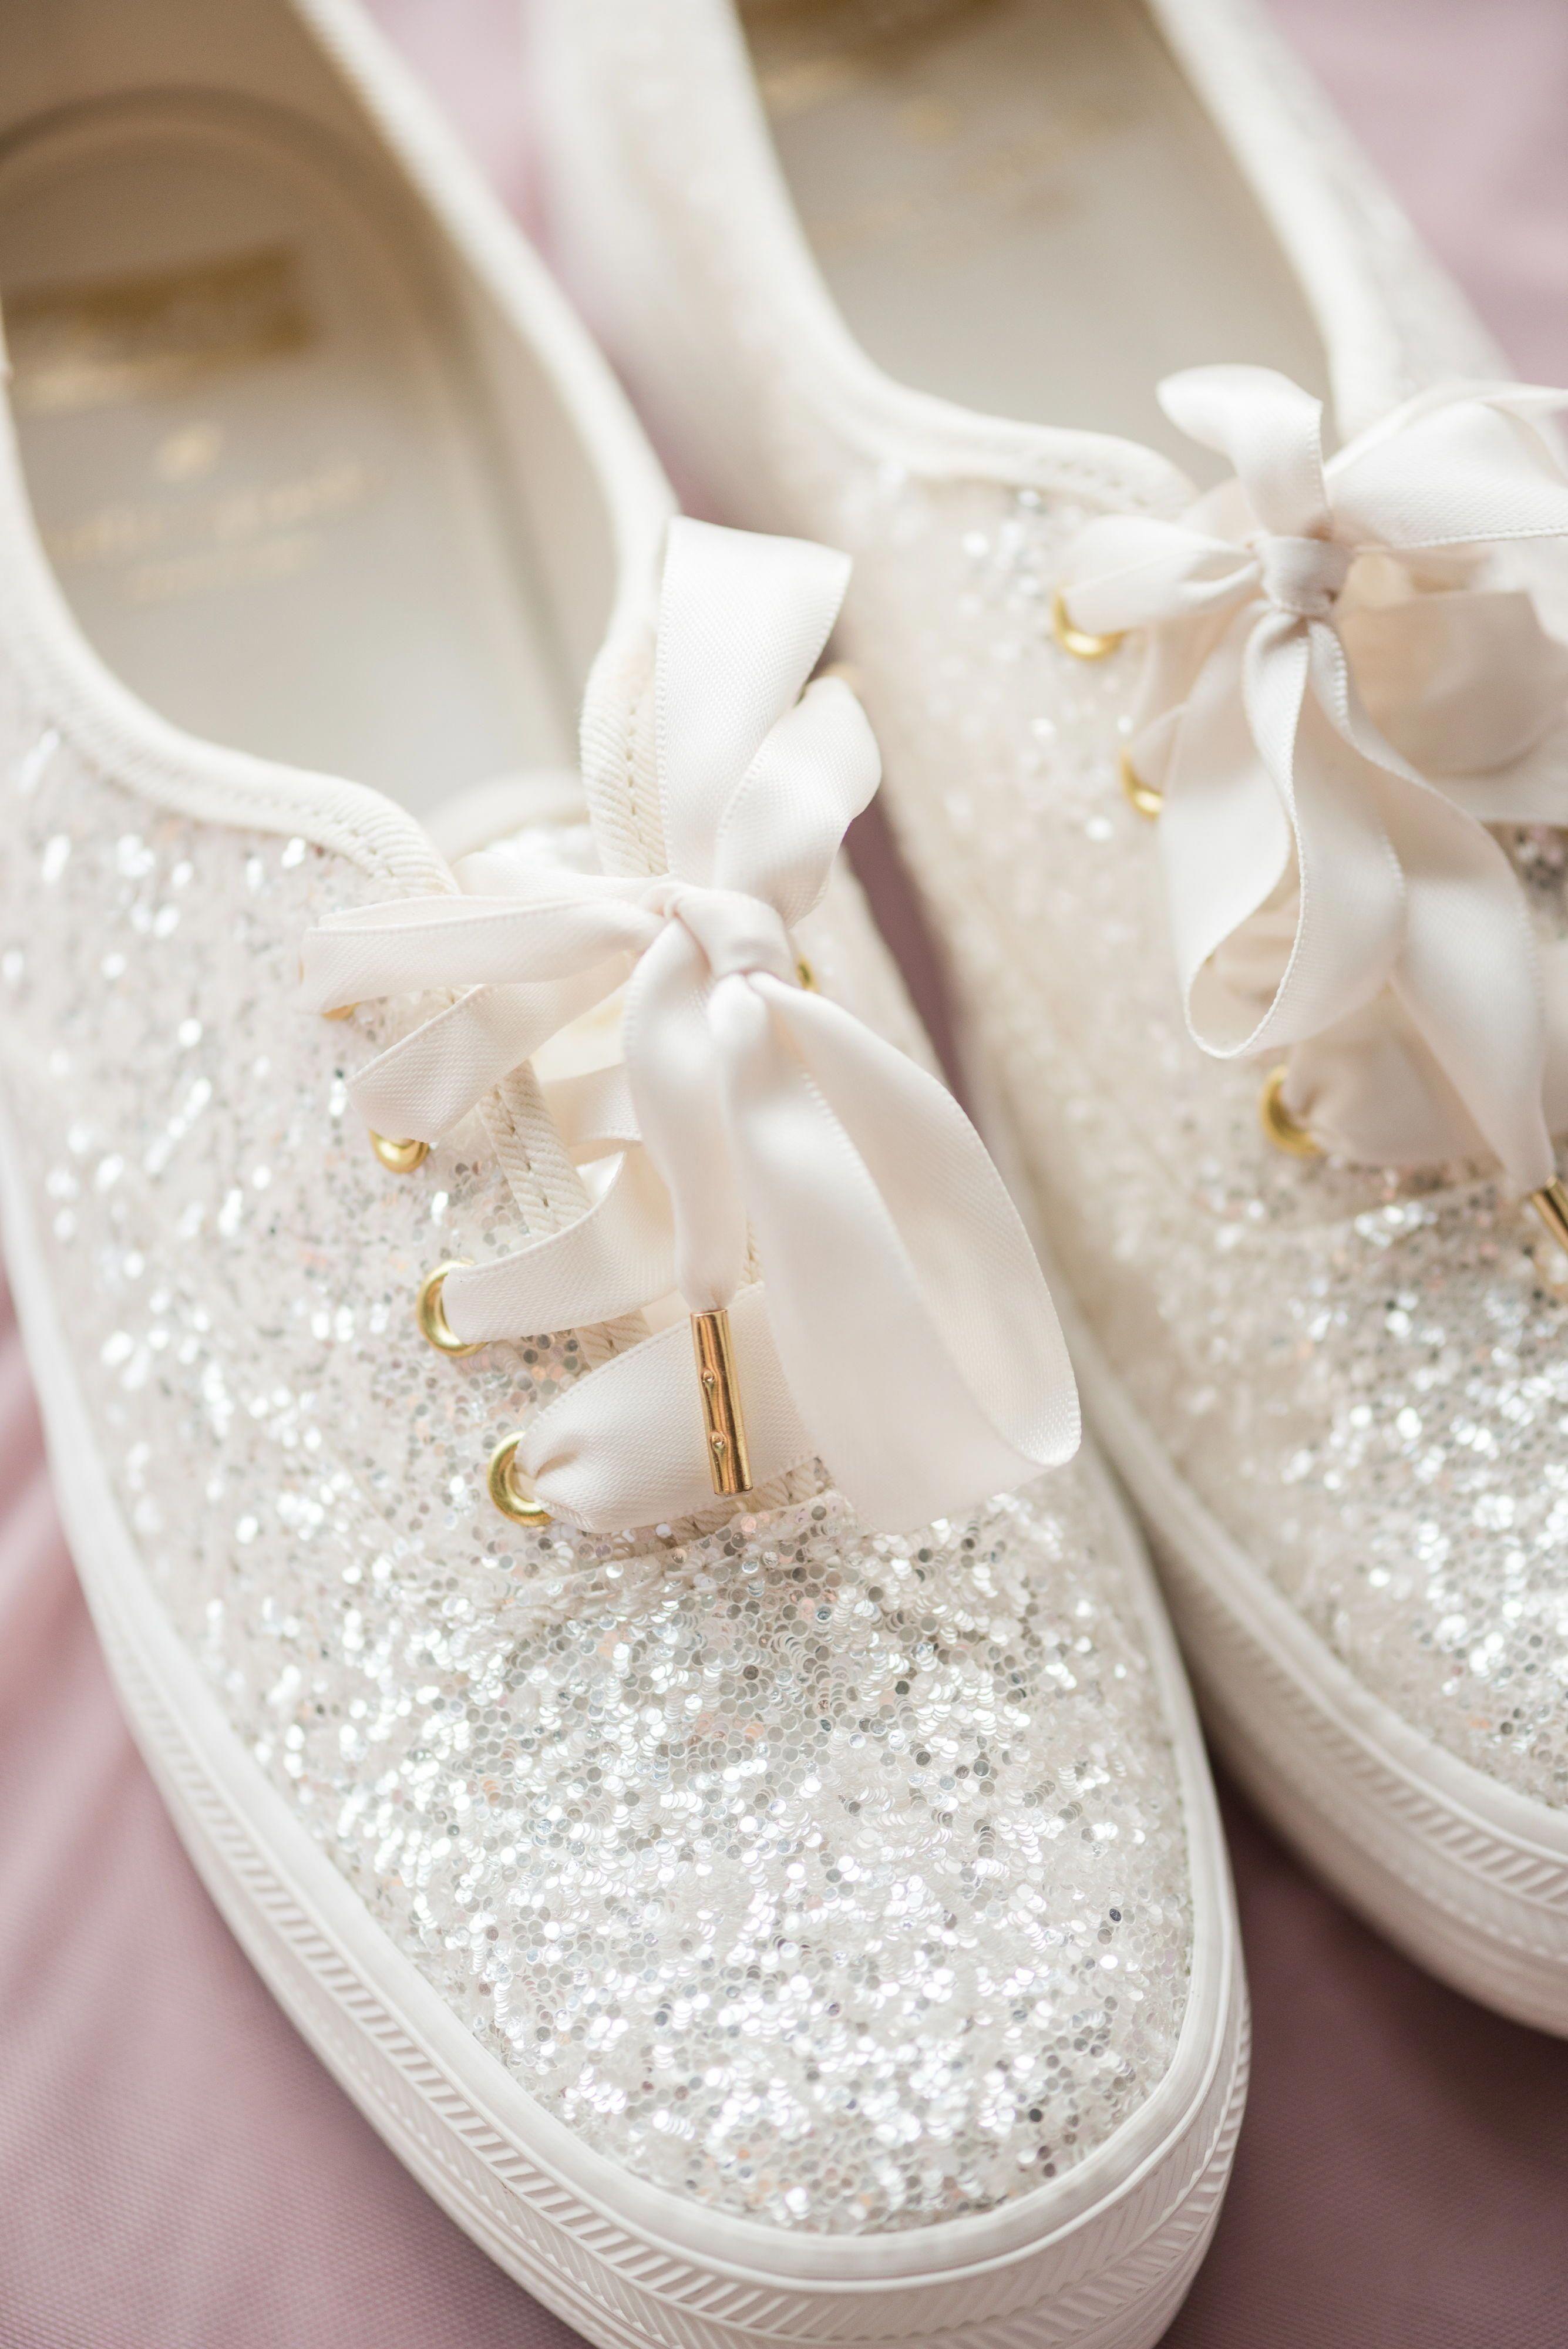 Sparkly glitter Kate Spade Keds for